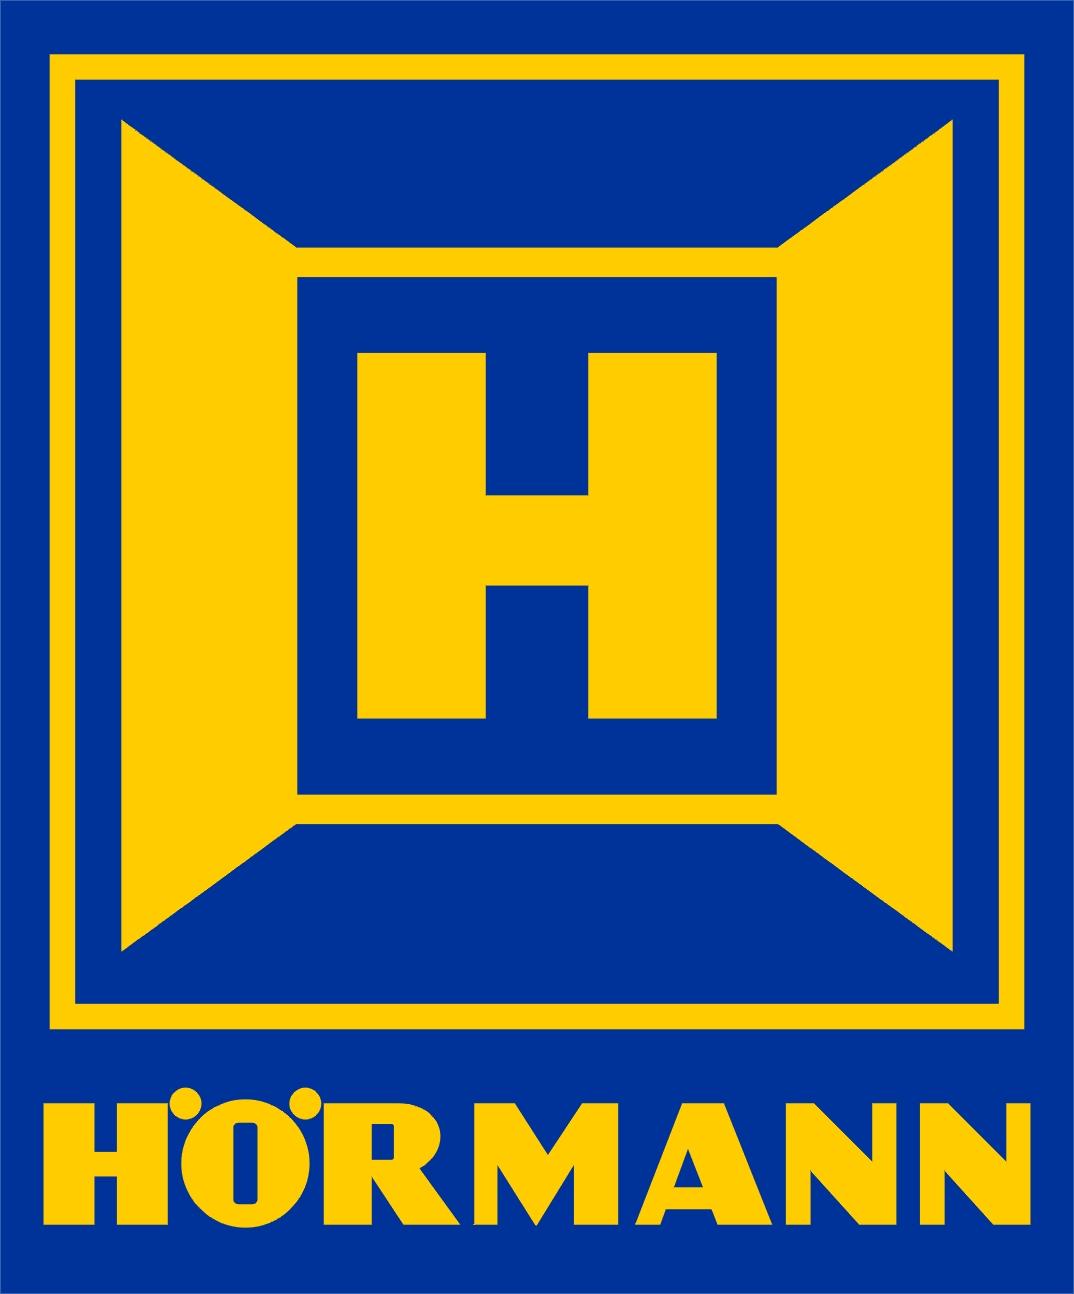 HormannLogoBig